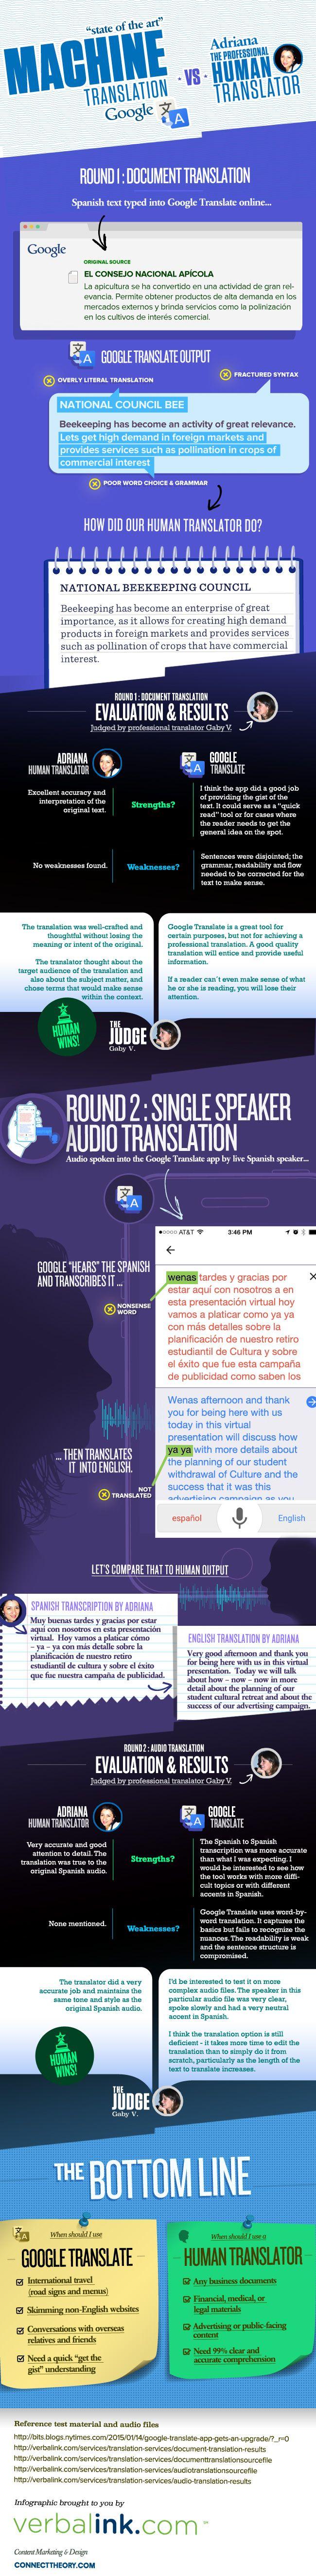 Google in Spanish | English to Spanish Translation ...